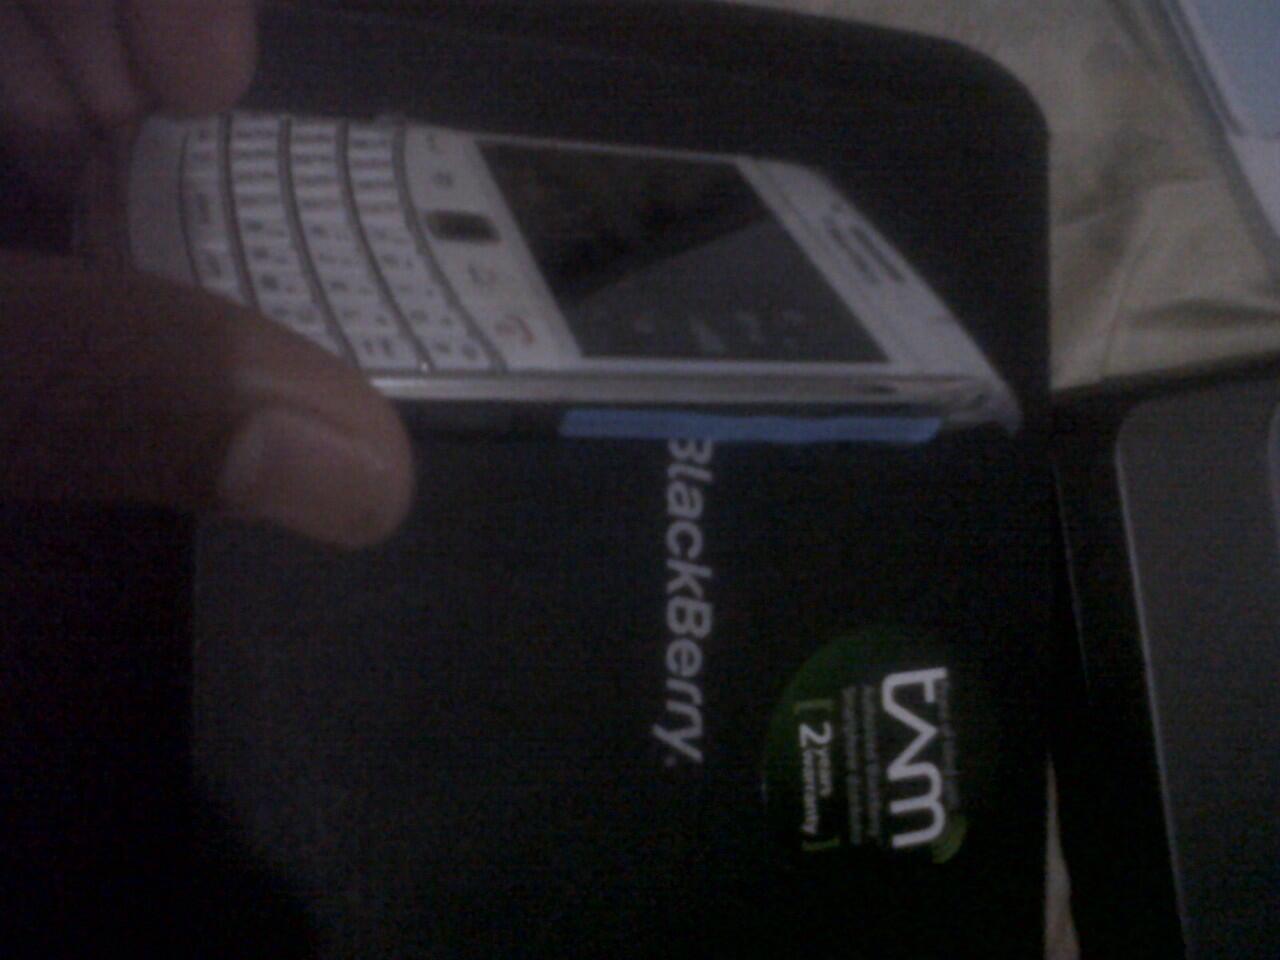 Jual Blackberry ONYX 2 atau 9870